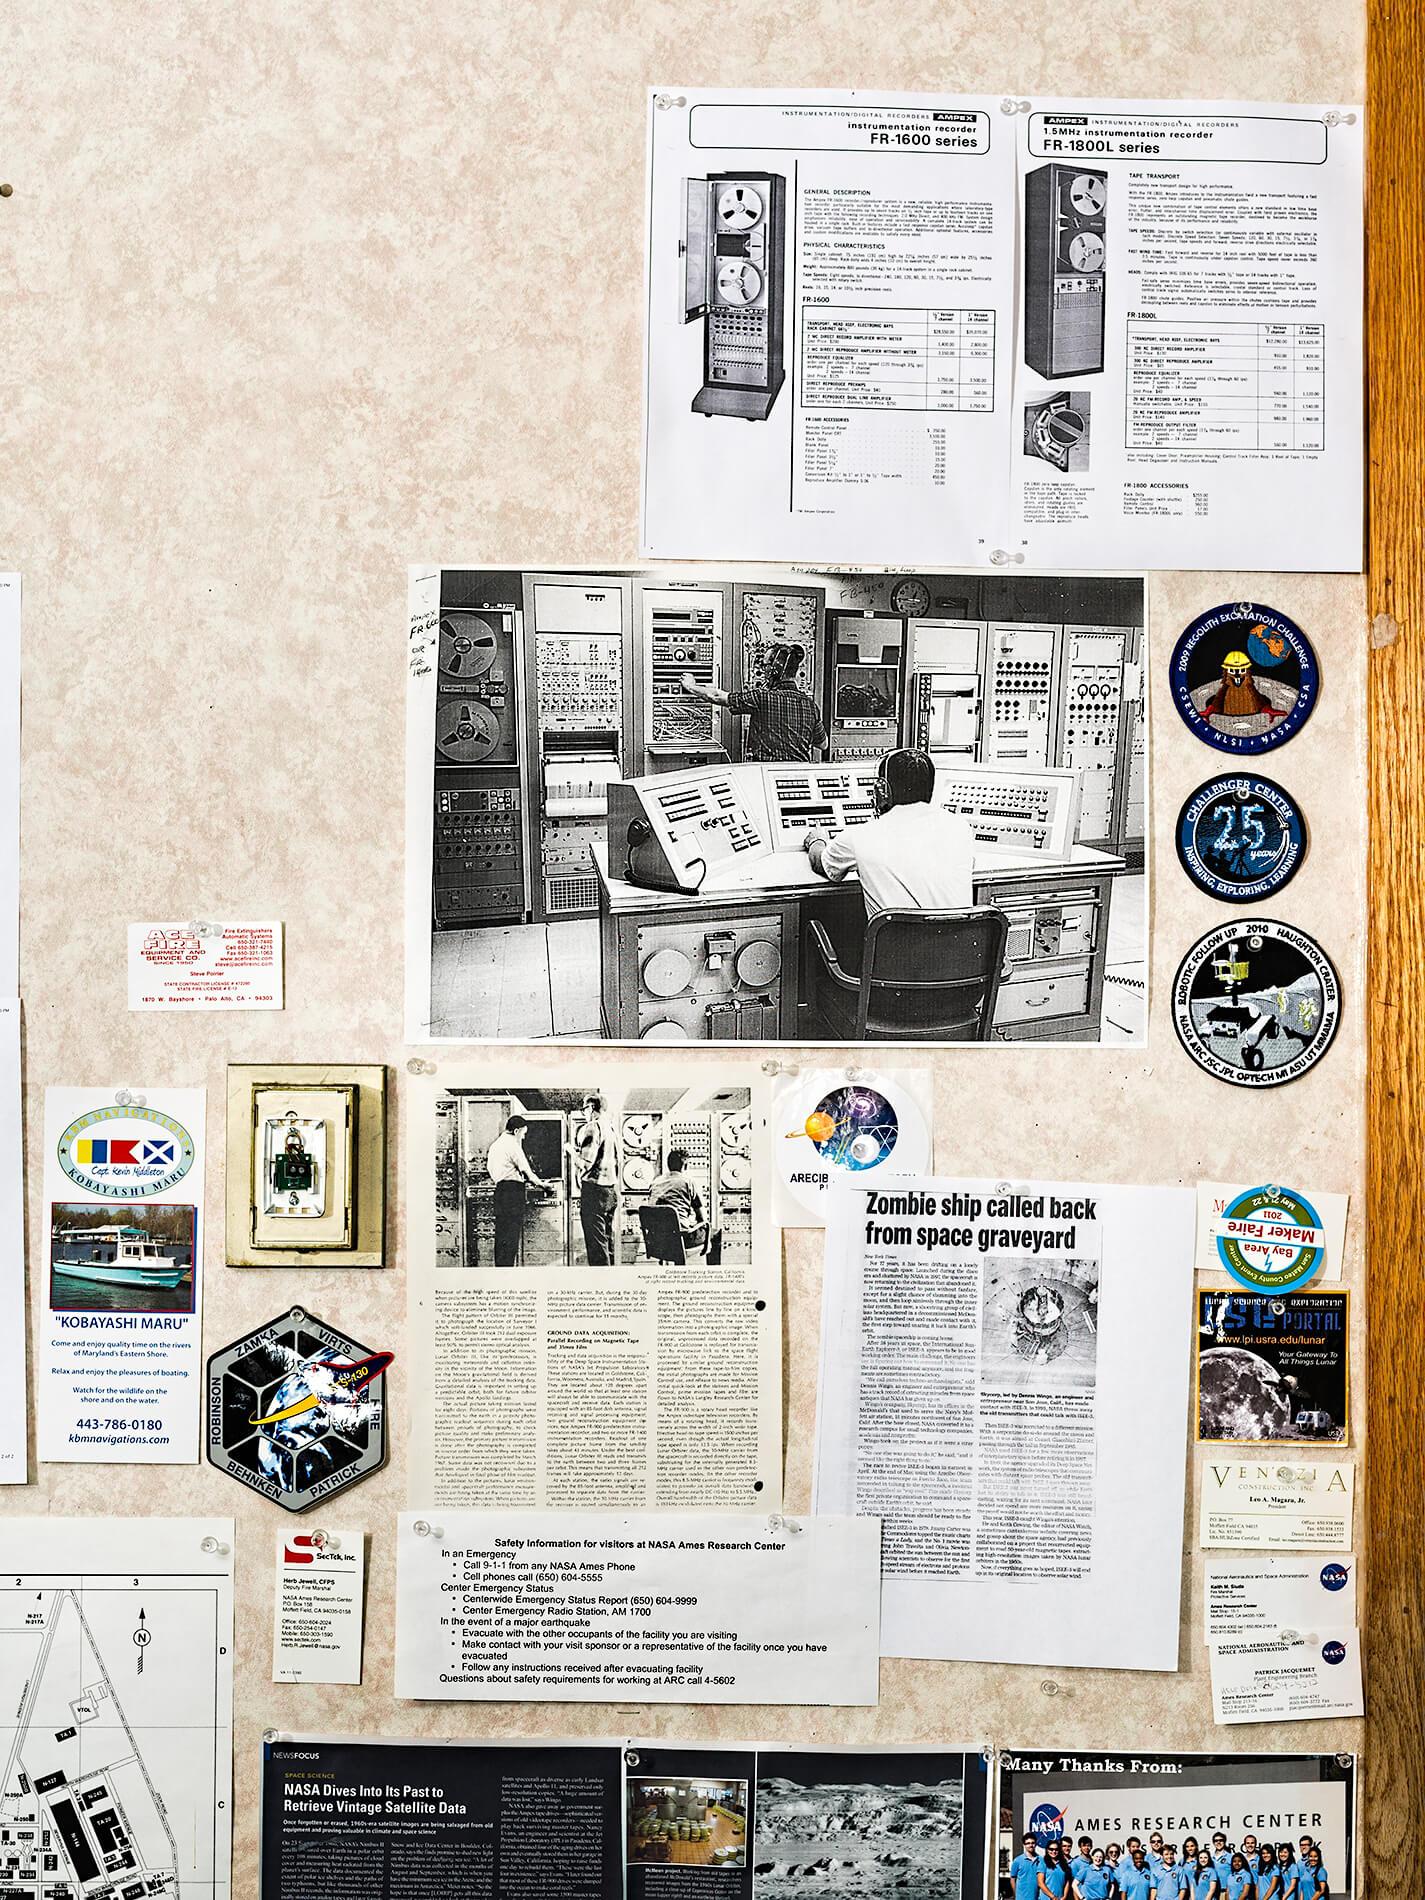 Space travel memorabilia and articles